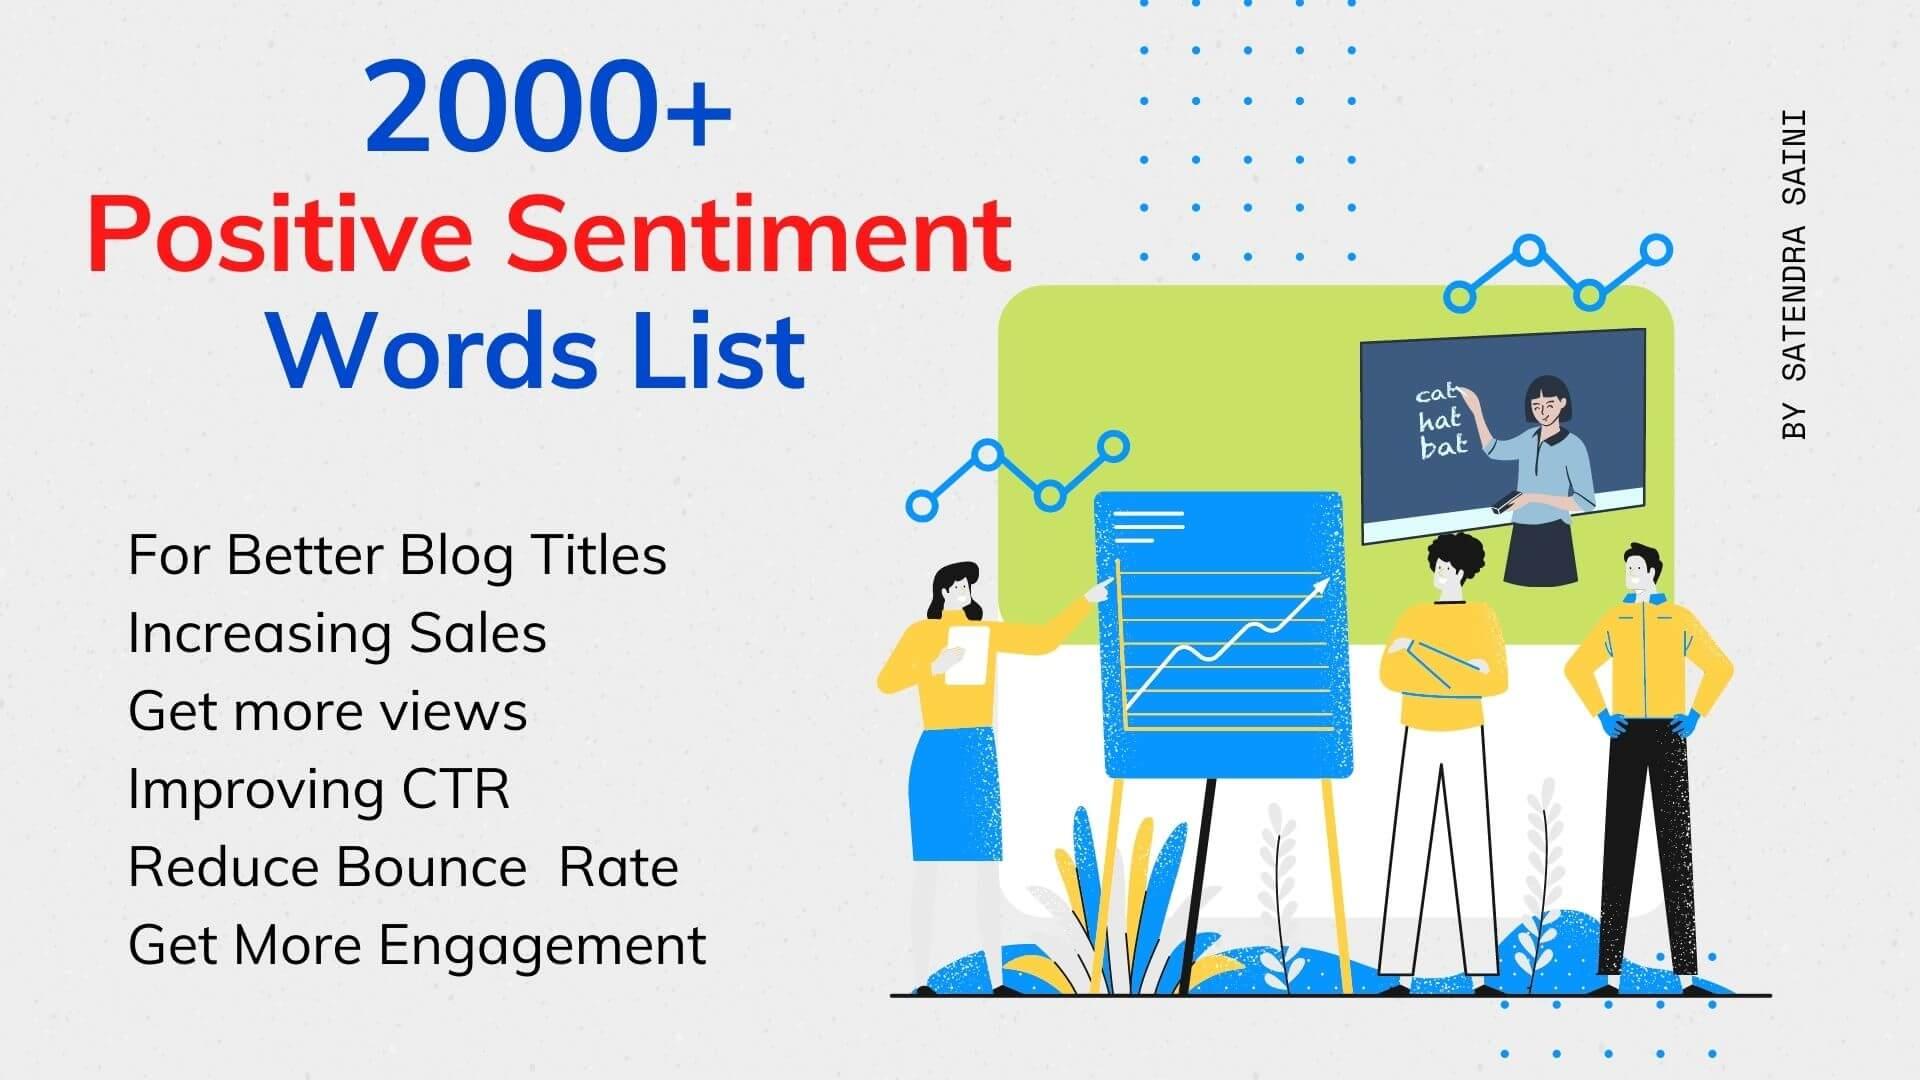 Positive and Negative Sentiment words list Positive Sentiment words list